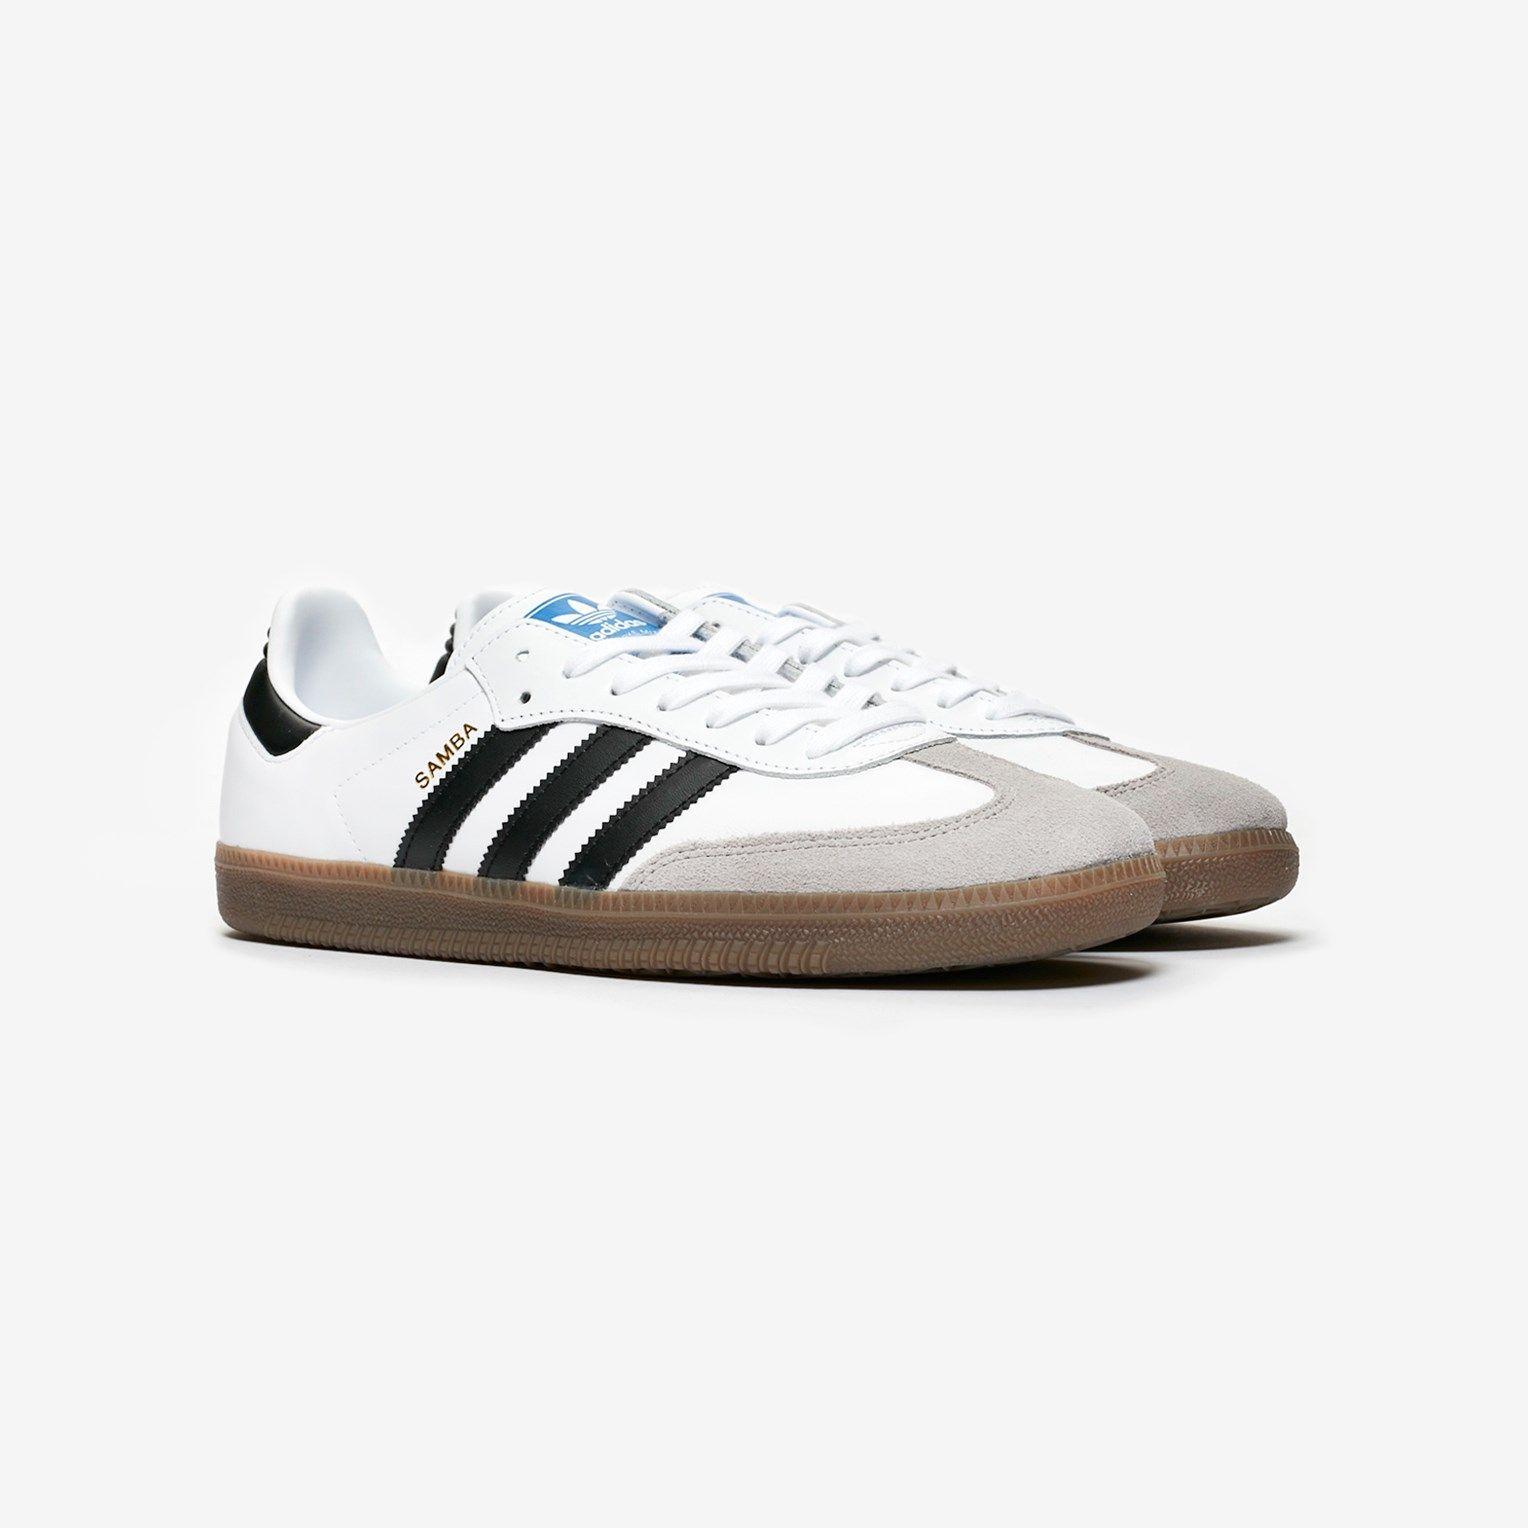 adidas Samba OG B75806 Sneakersnstuff | sneakers